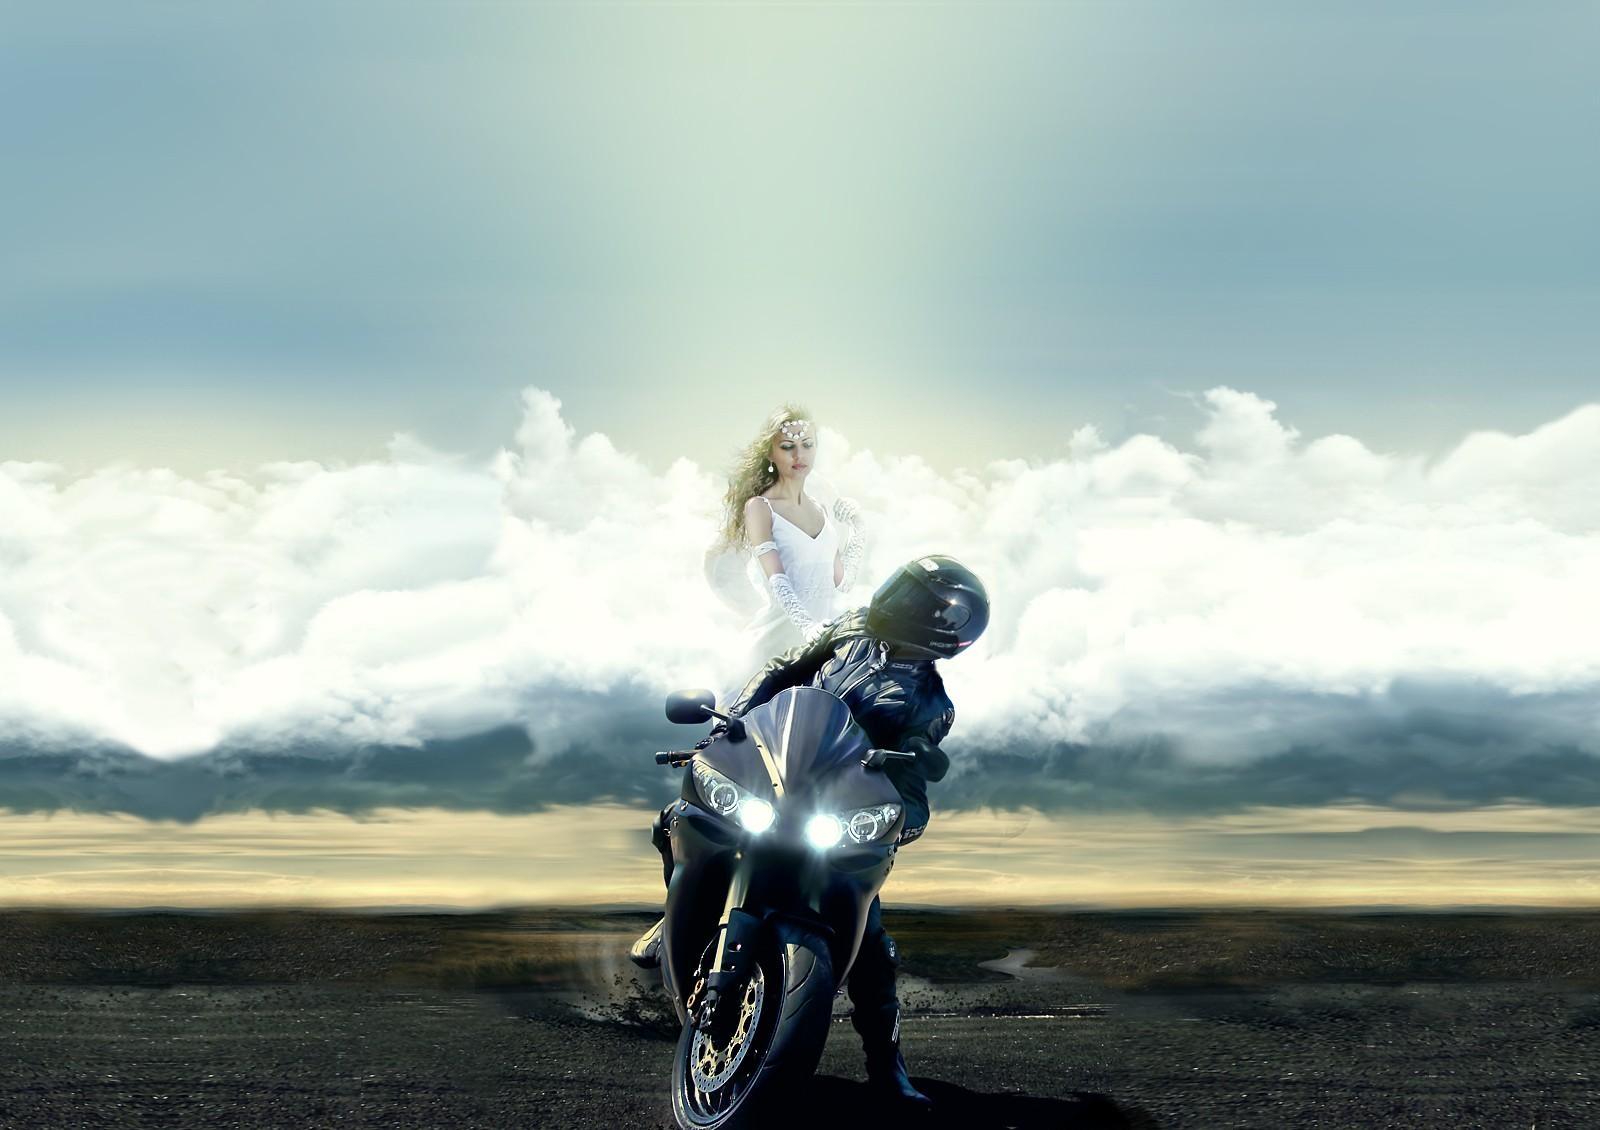 Girl On Motorcycle Desktop Wallpaper Hintergrundbilder Motorradfahrer Schutzengel Wolken